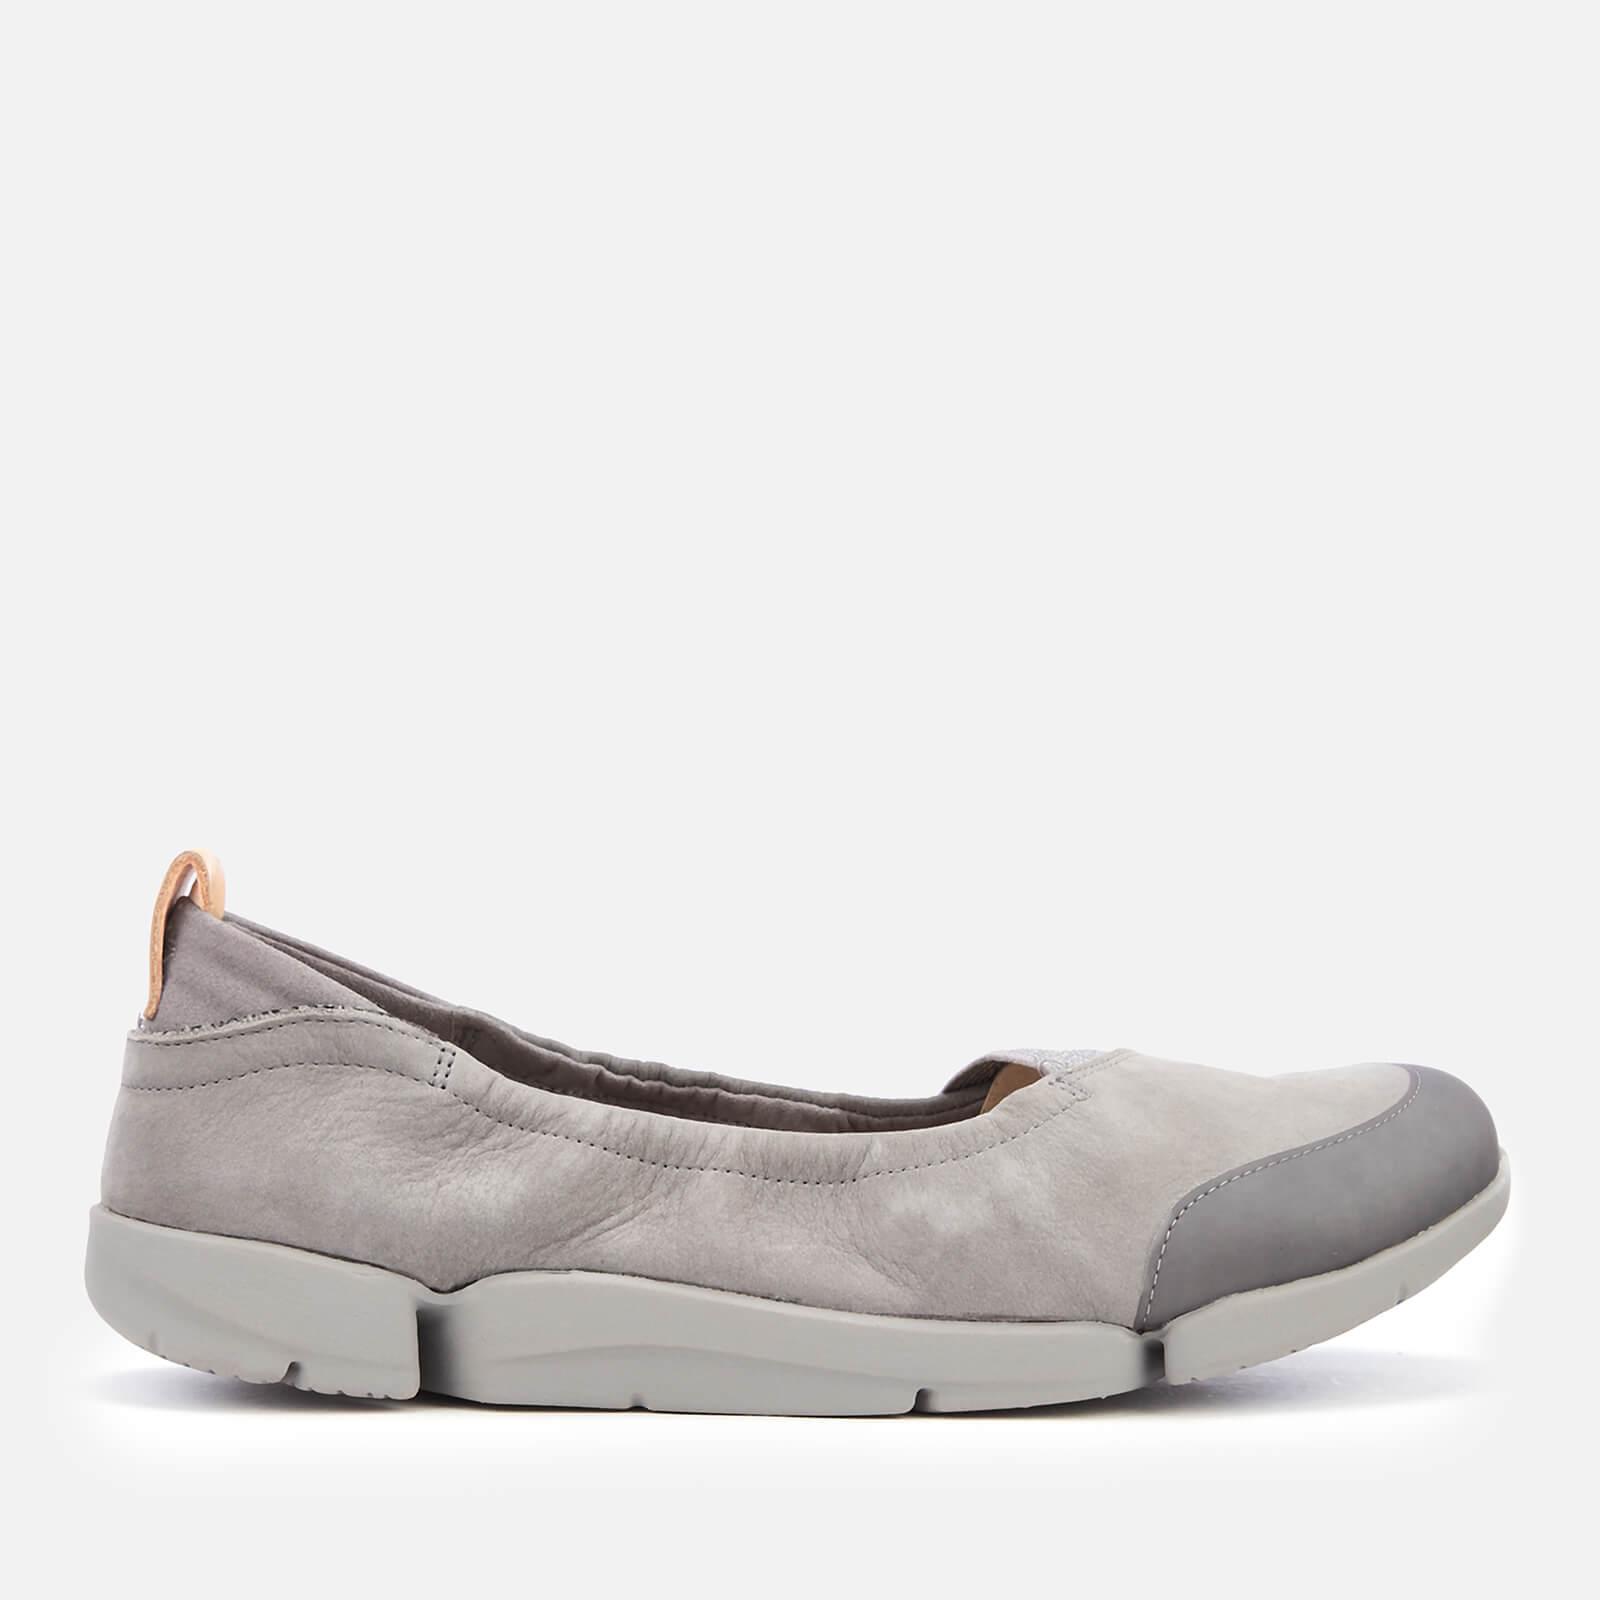 c76930a840 Clarks Women's Tri Adapt Nubuck Flats - Grey Womens Footwear ...